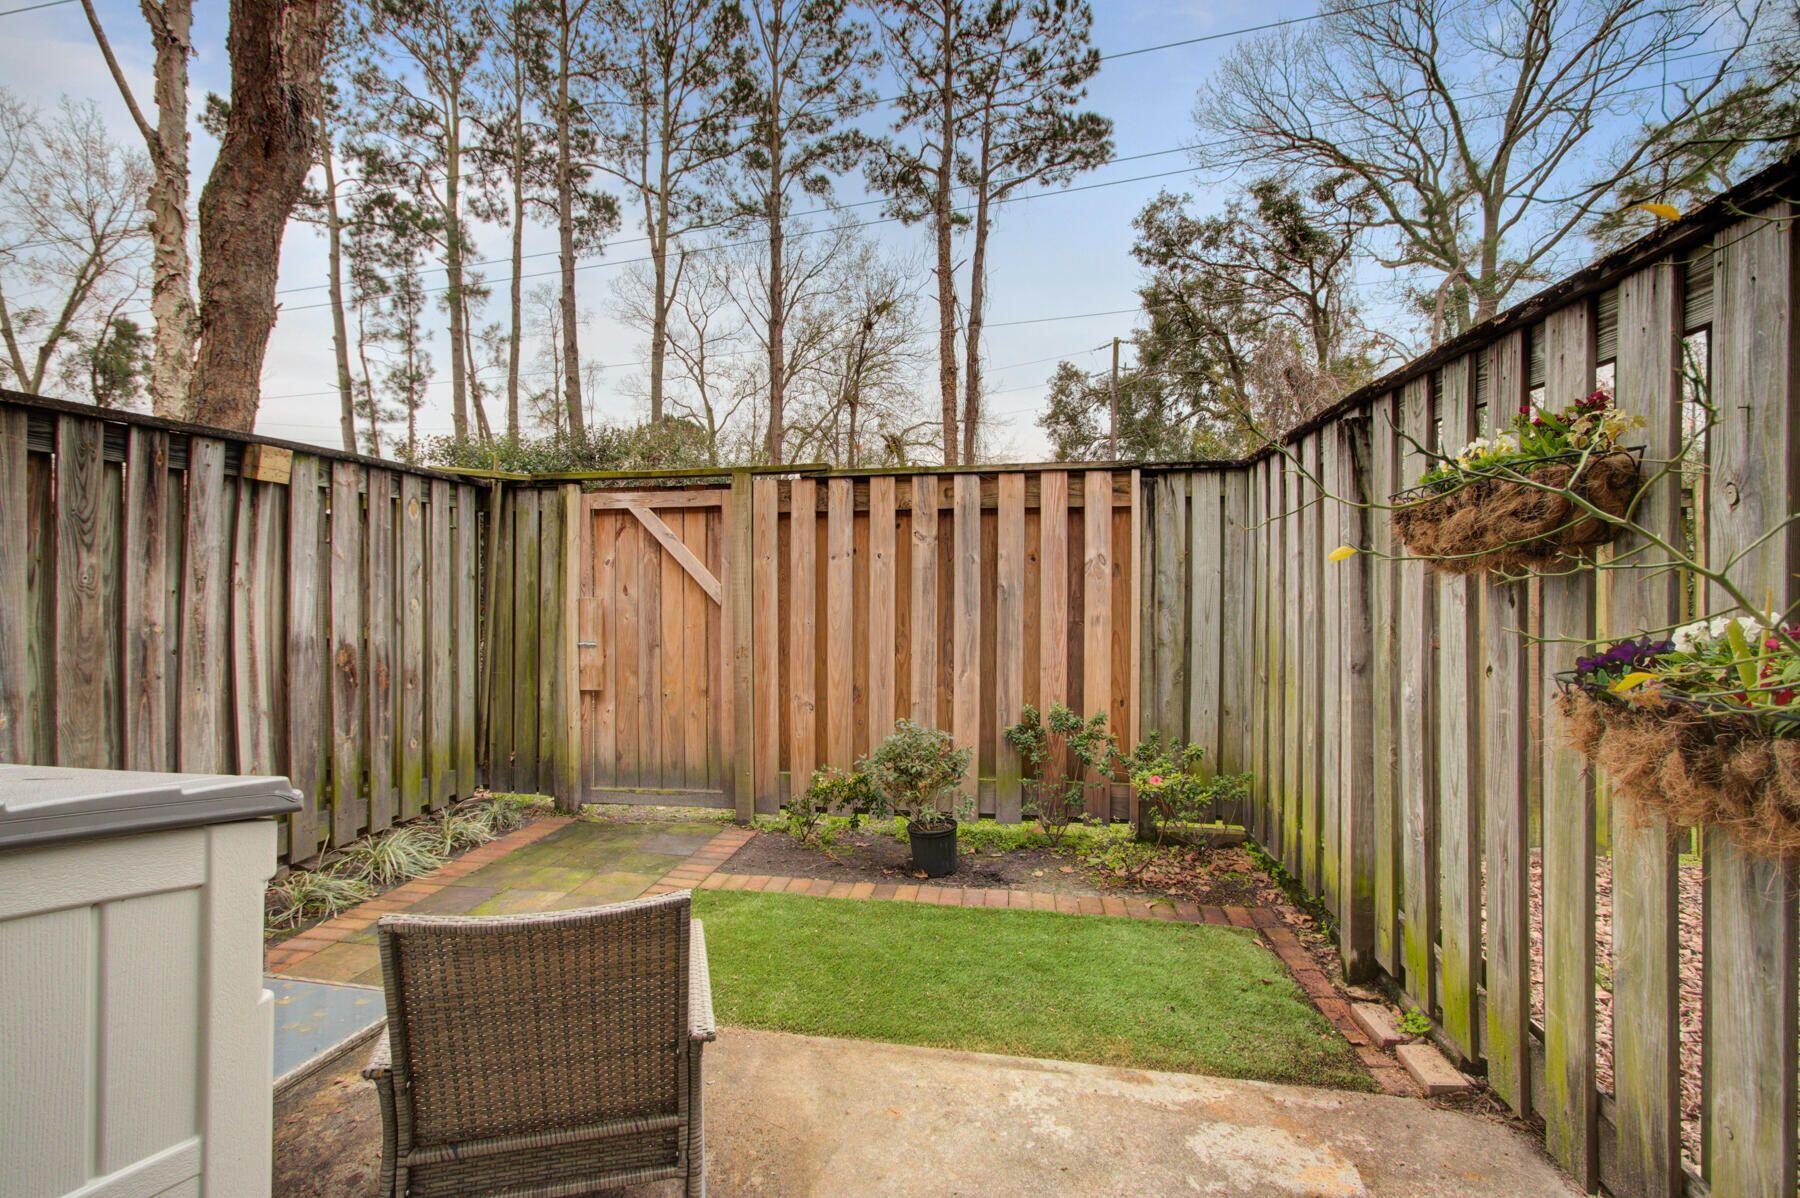 Wildwood Town Homes Homes For Sale - 507 Stinson, Charleston, SC - 3